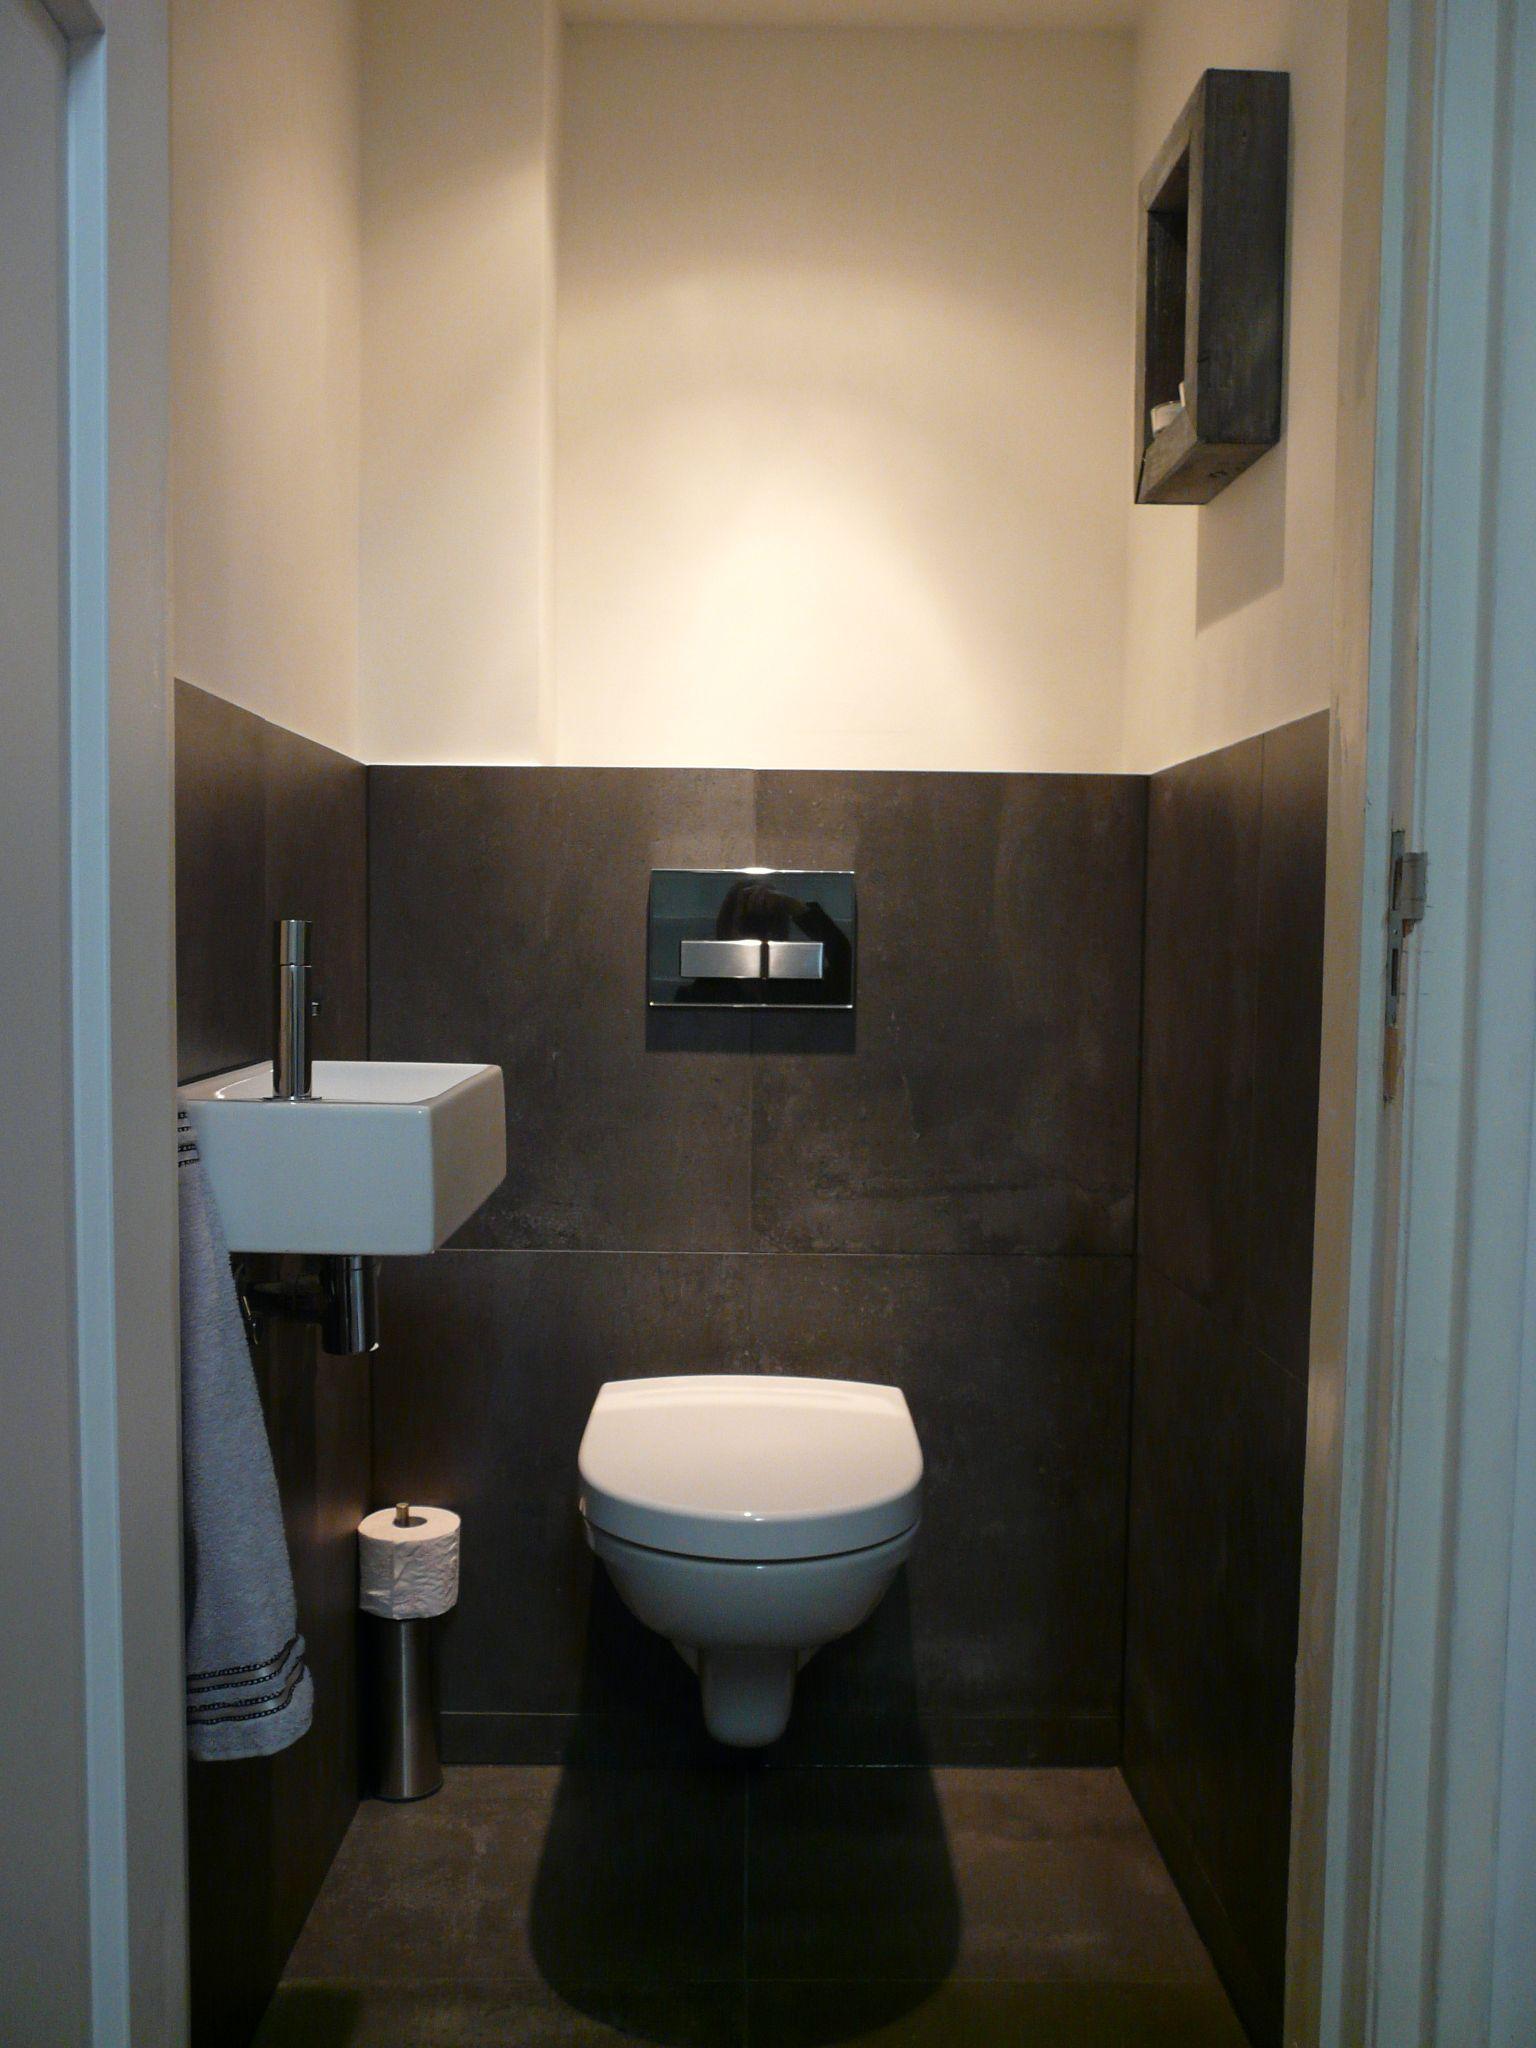 Wc apart met donkere vtwonen tegels wandtegels keramisch pinterest toilet powder room and - Wc tegel ...